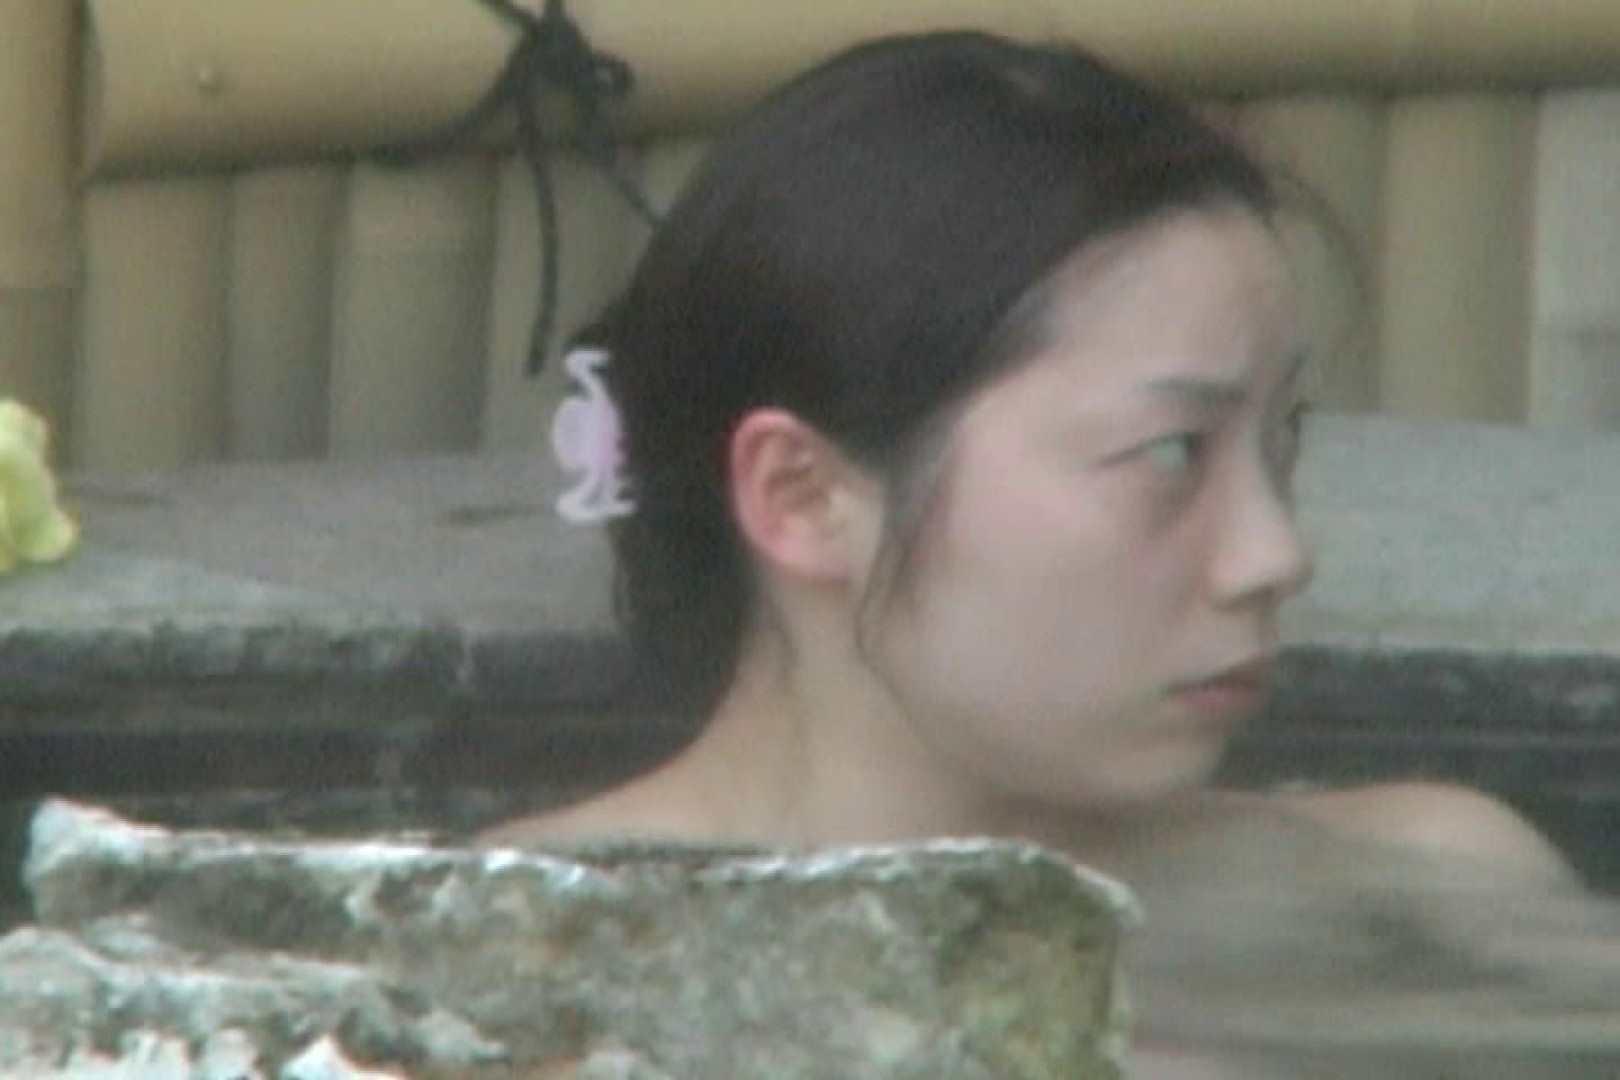 Aquaな露天風呂Vol.596 OLセックス  77画像 15